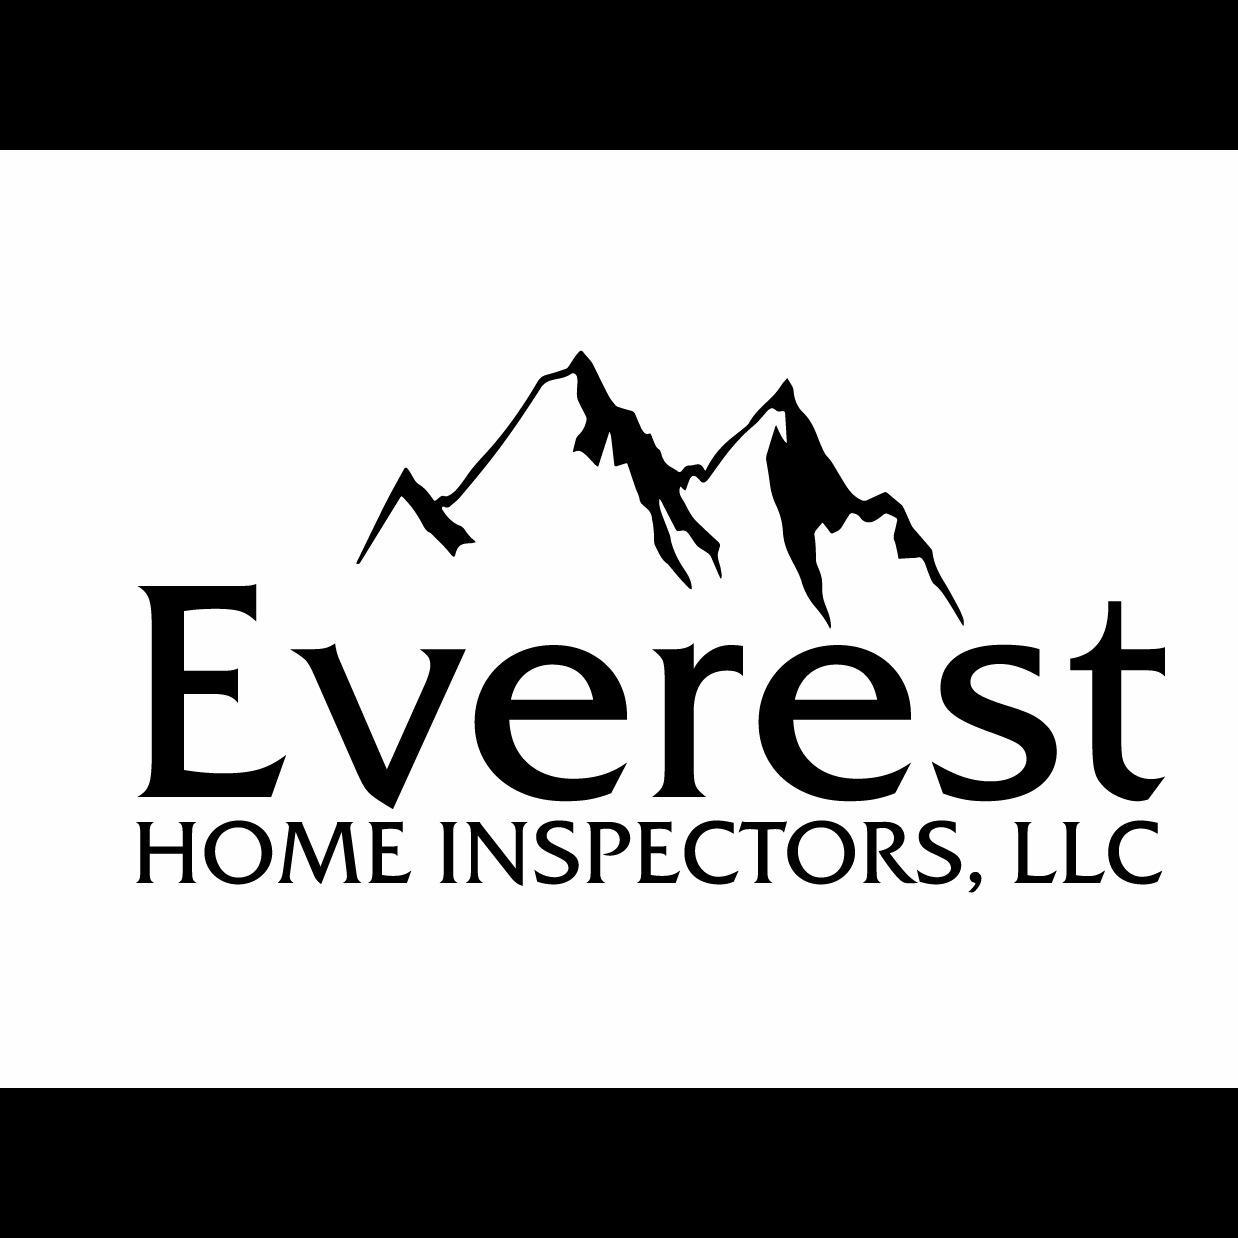 Everest Home Inspectors image 6